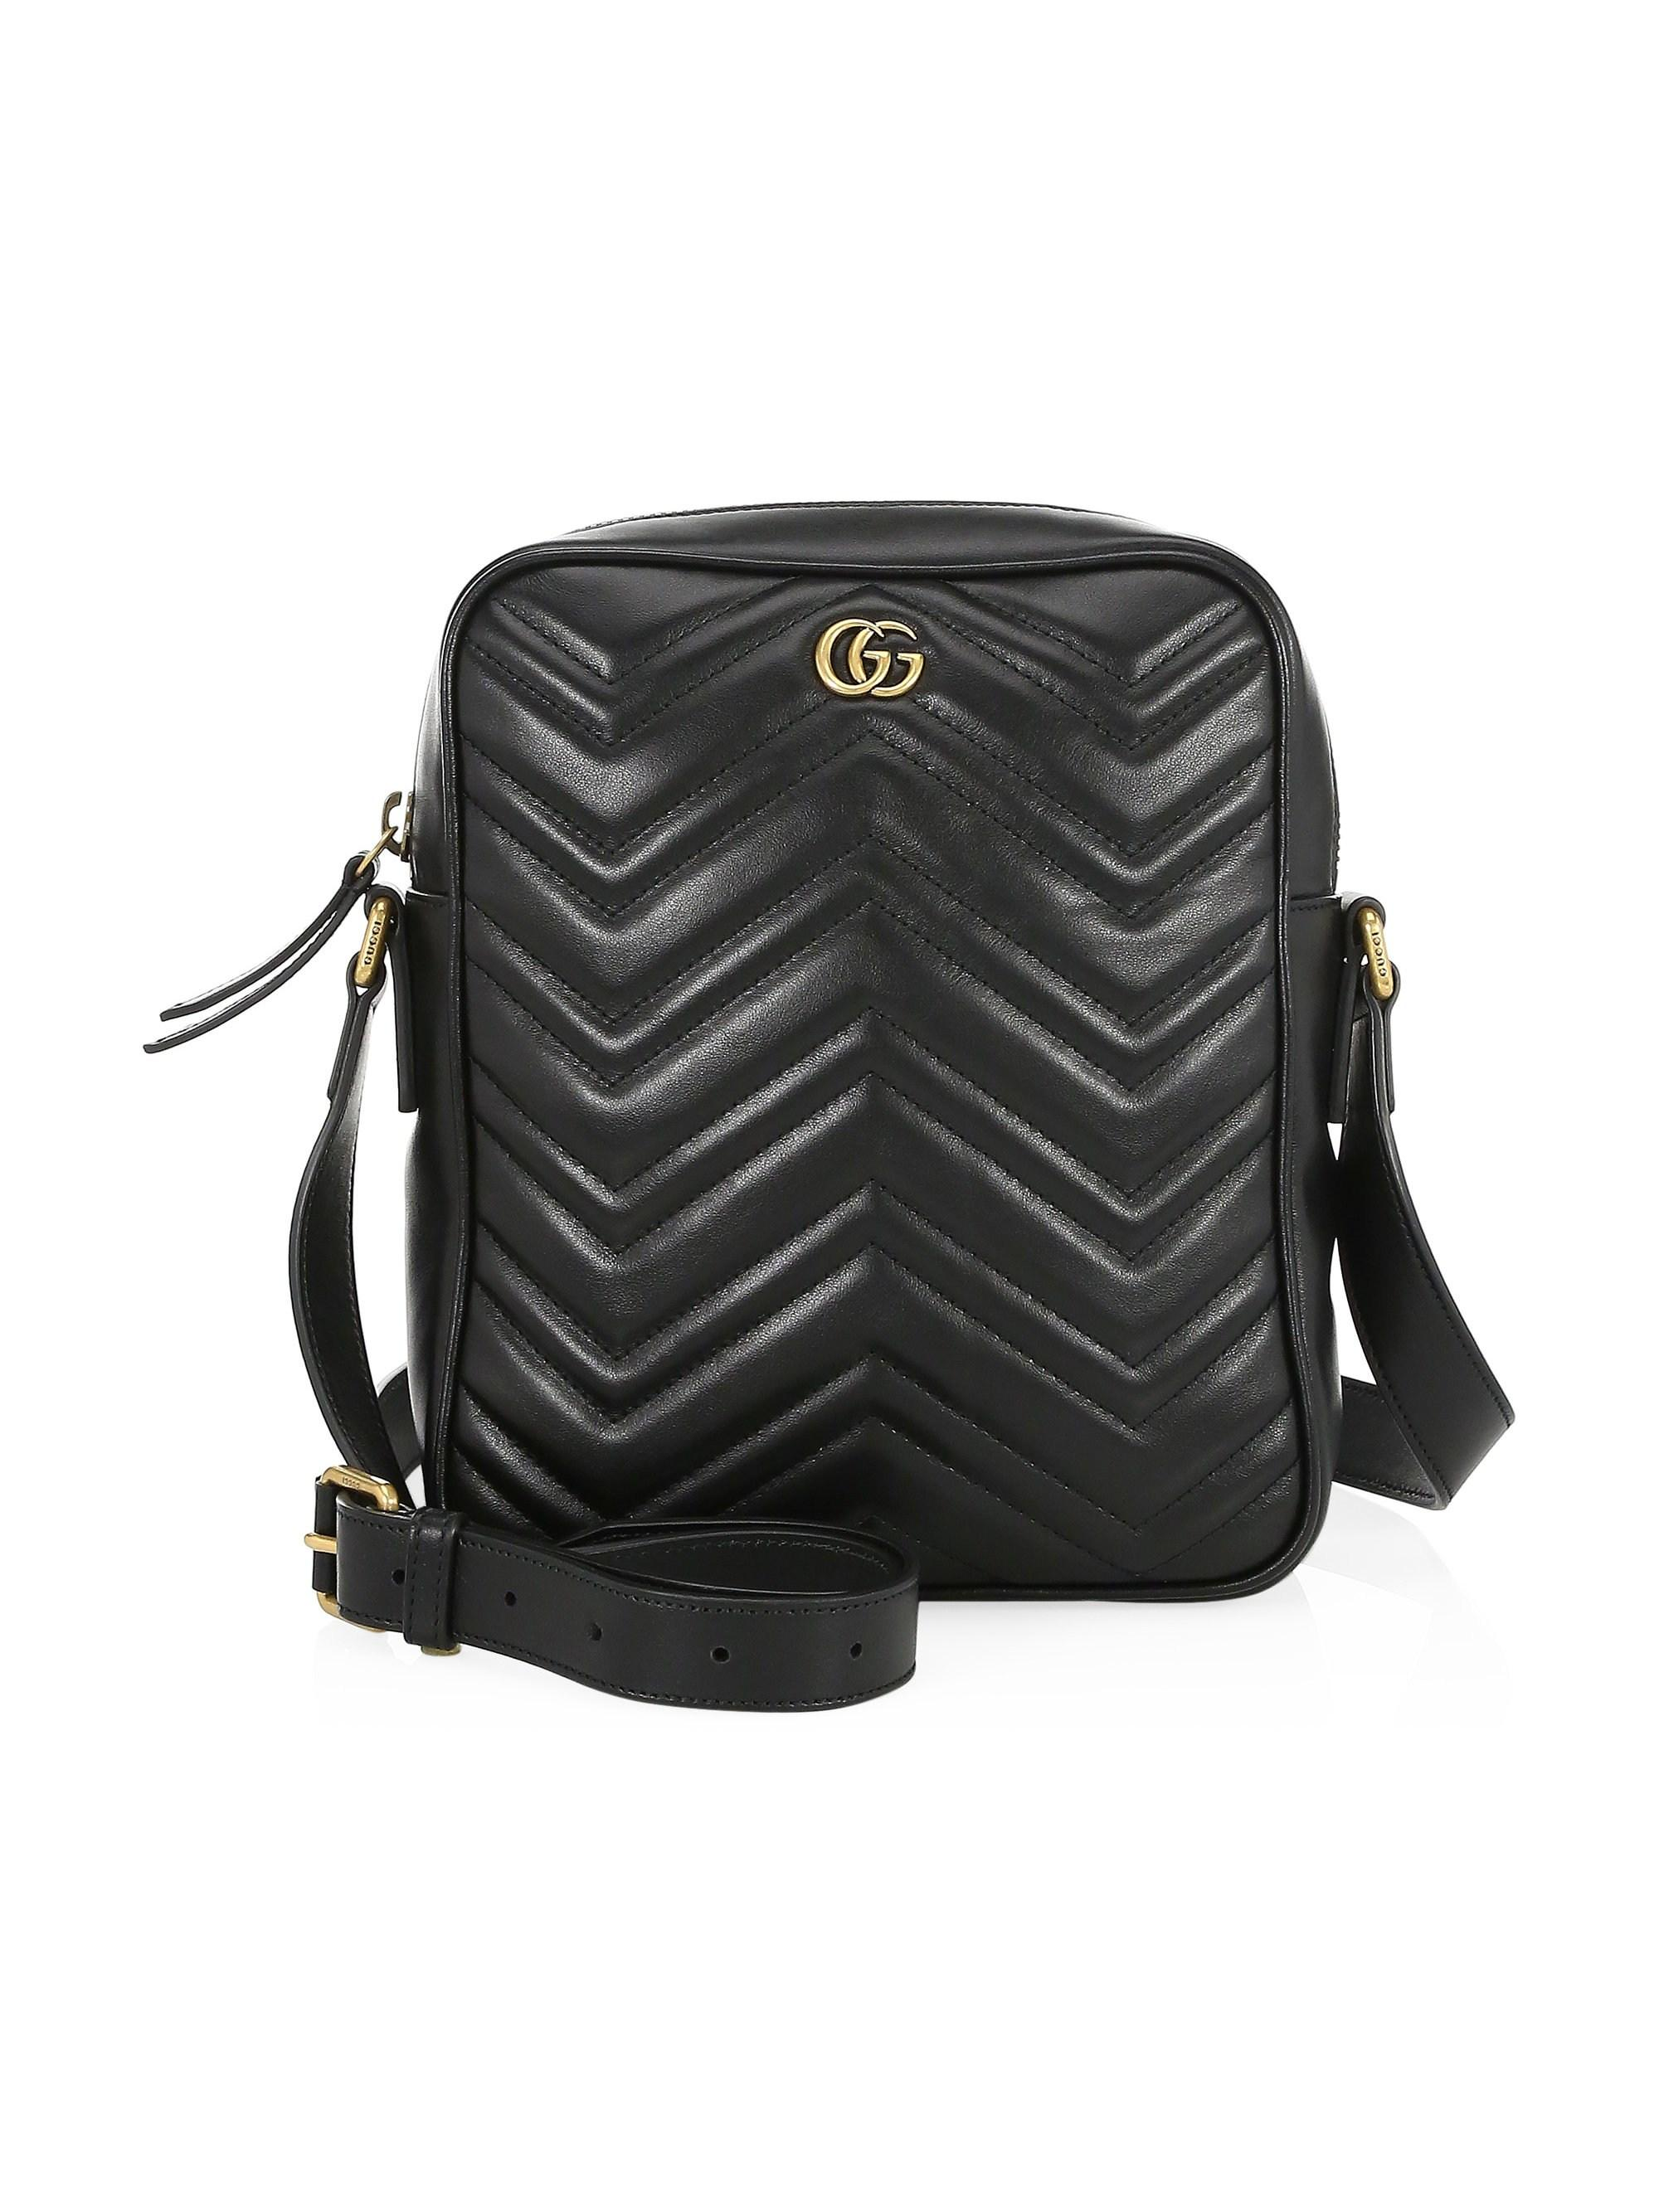 0514bc667 Gucci Men's GG Marmont Leather Shoulder Bag - Nero in Black for Men ...